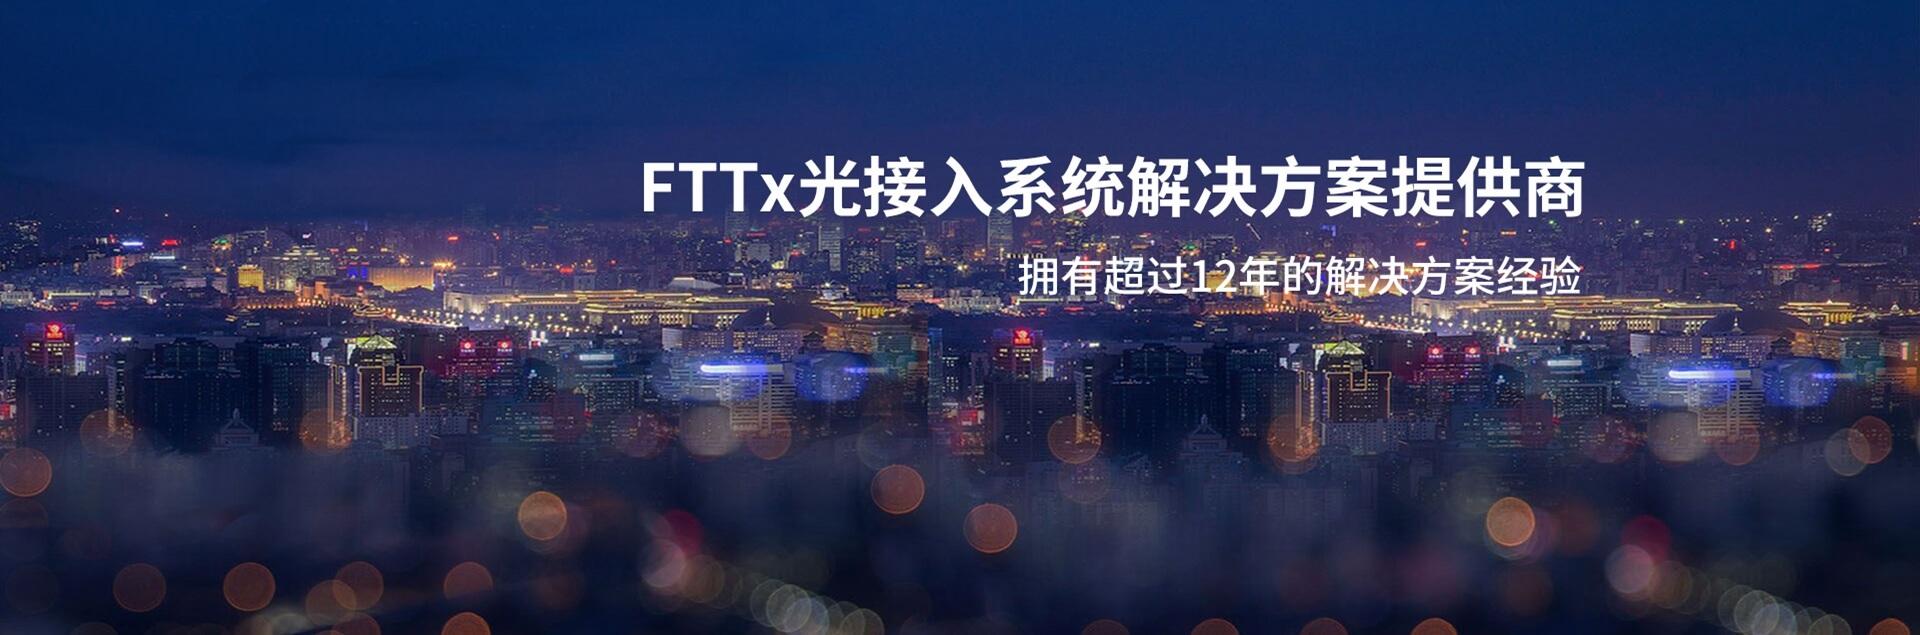 FTTx光接入系统解决方案提供商